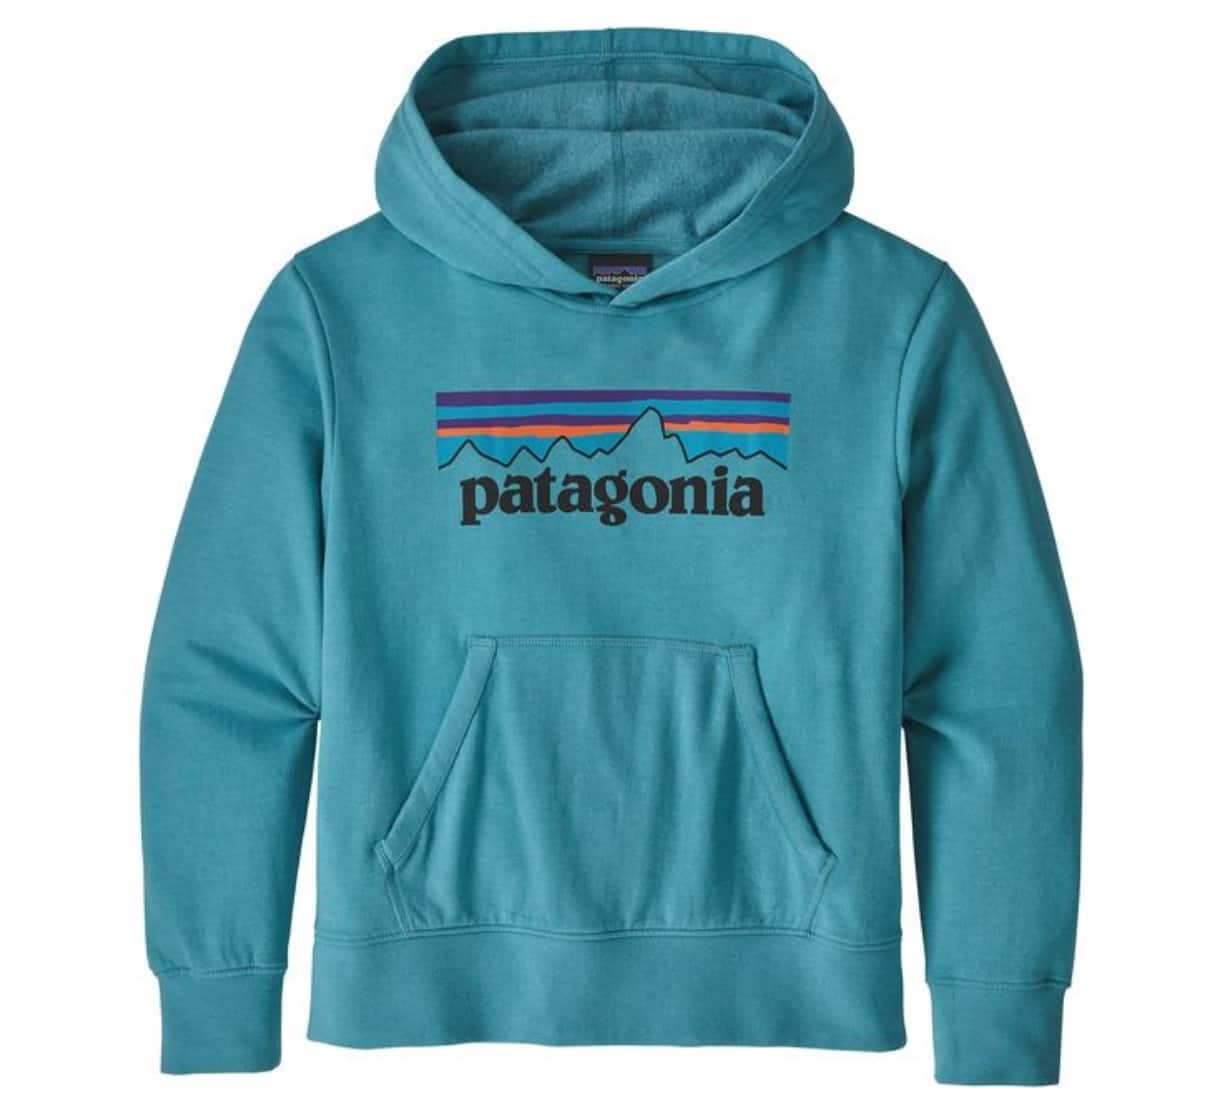 Patagonia Kids' Lightweight Graphic Hoody Sweatshirt